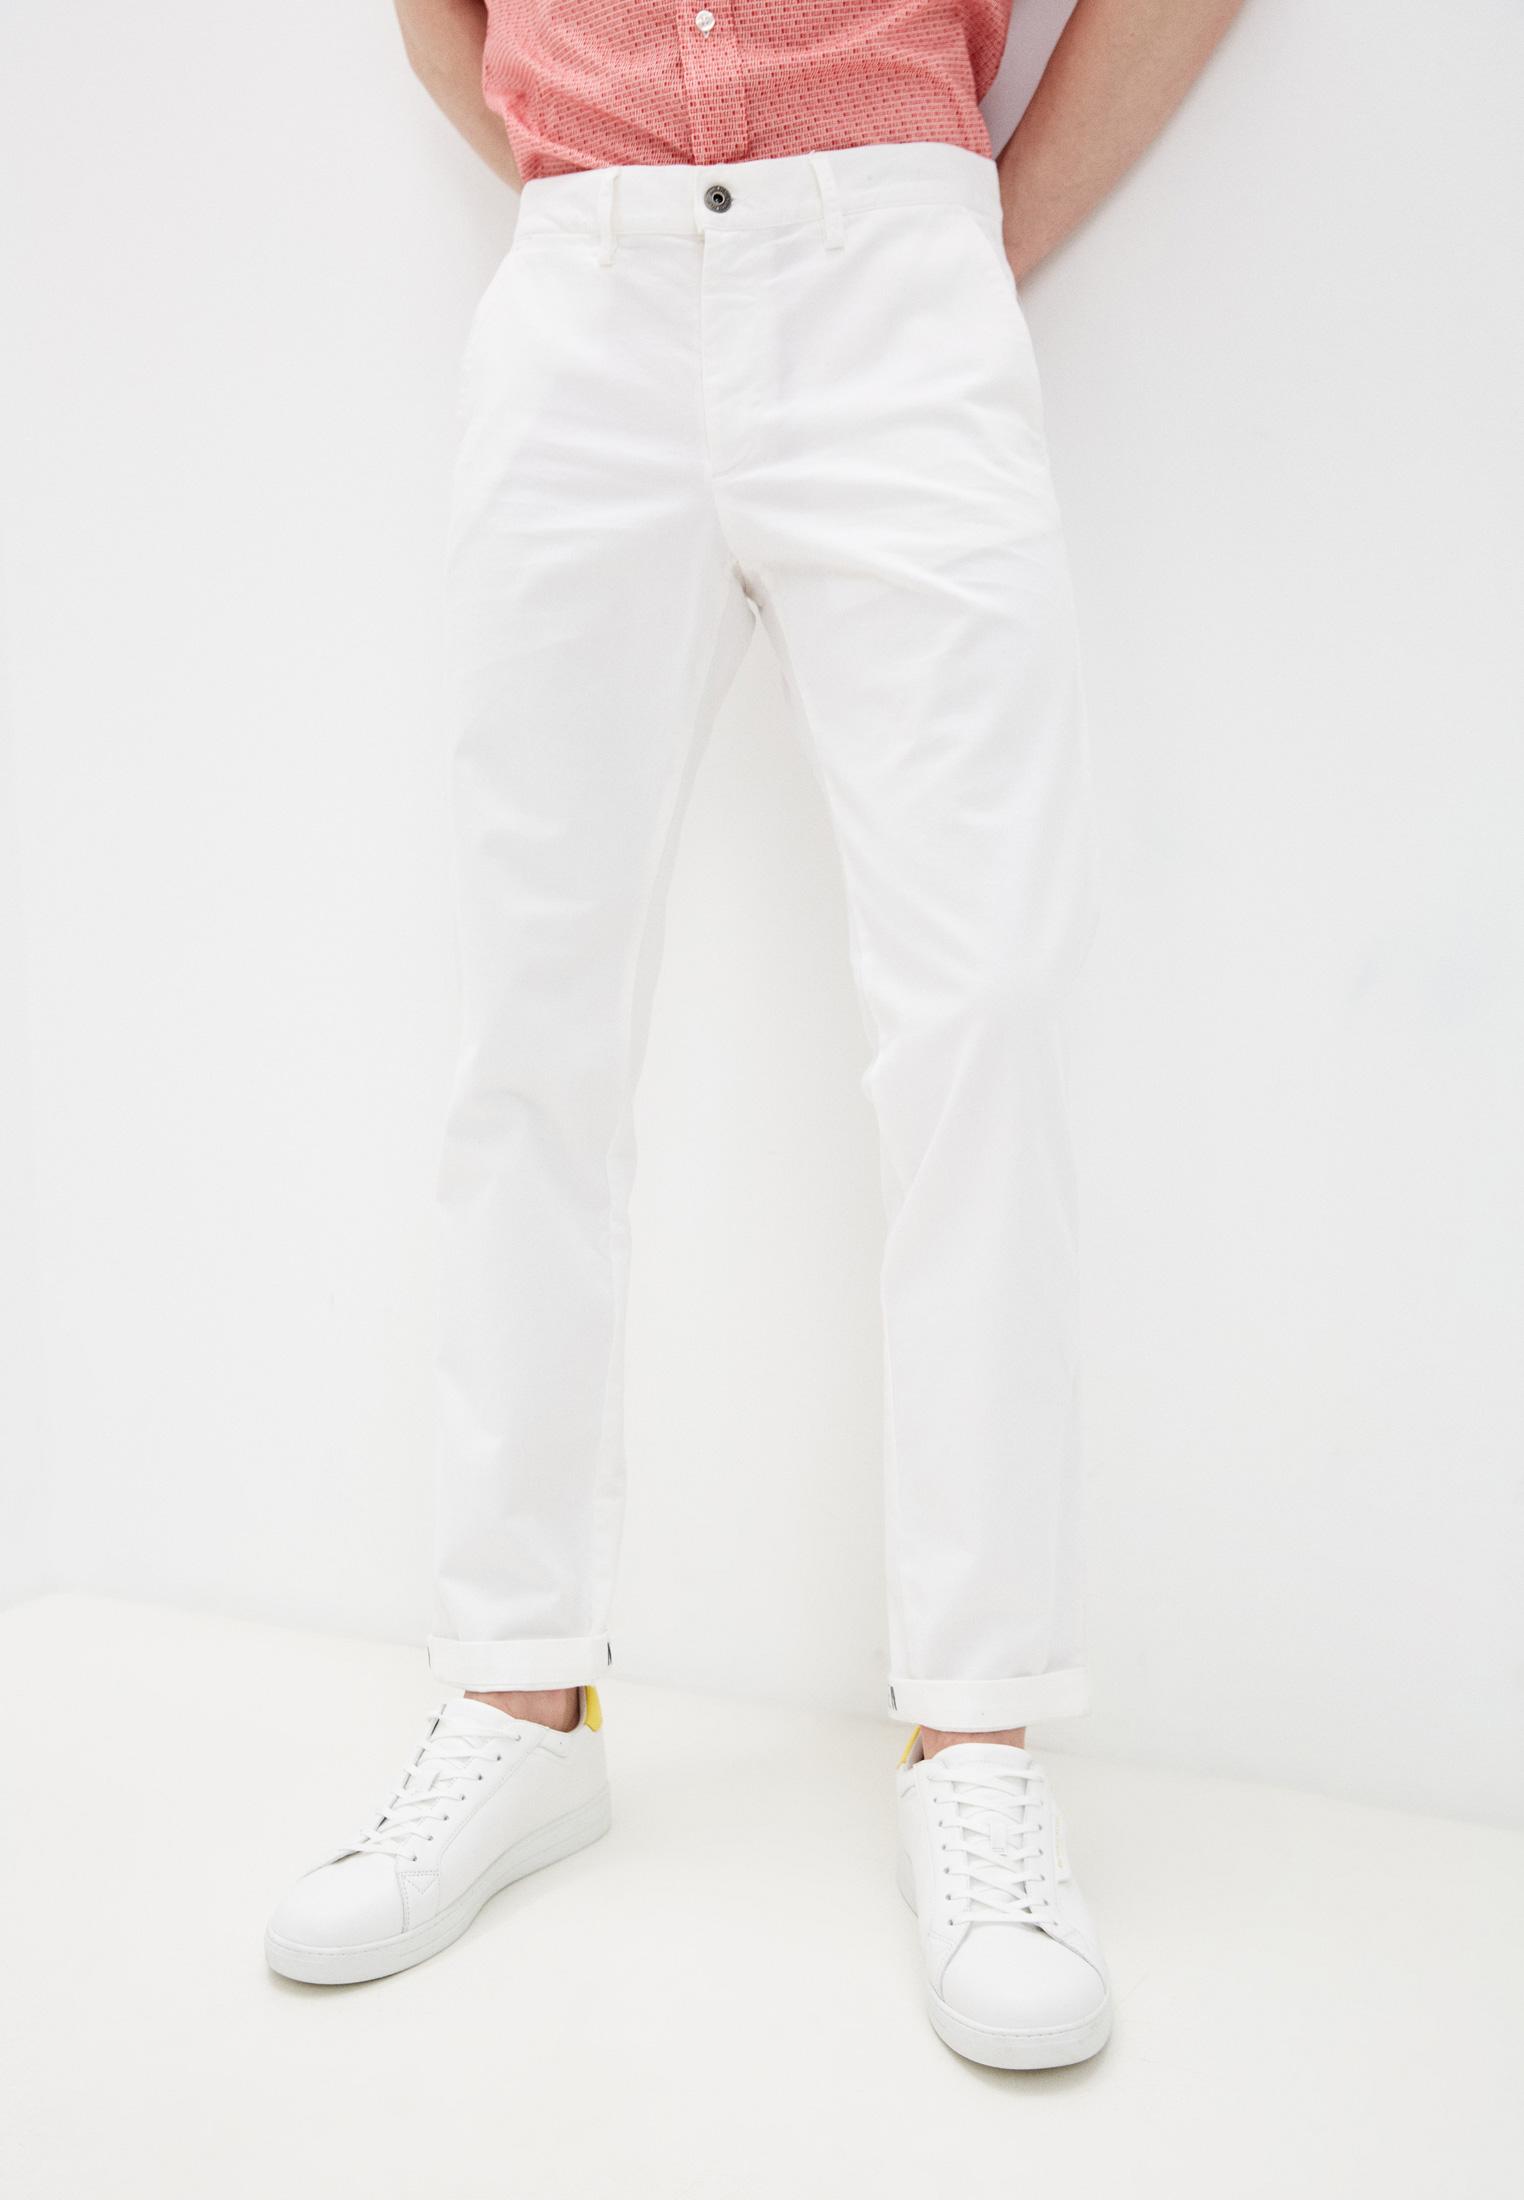 Мужские повседневные брюки Bikkembergs (Биккембергс) C P 001 01 S 3394